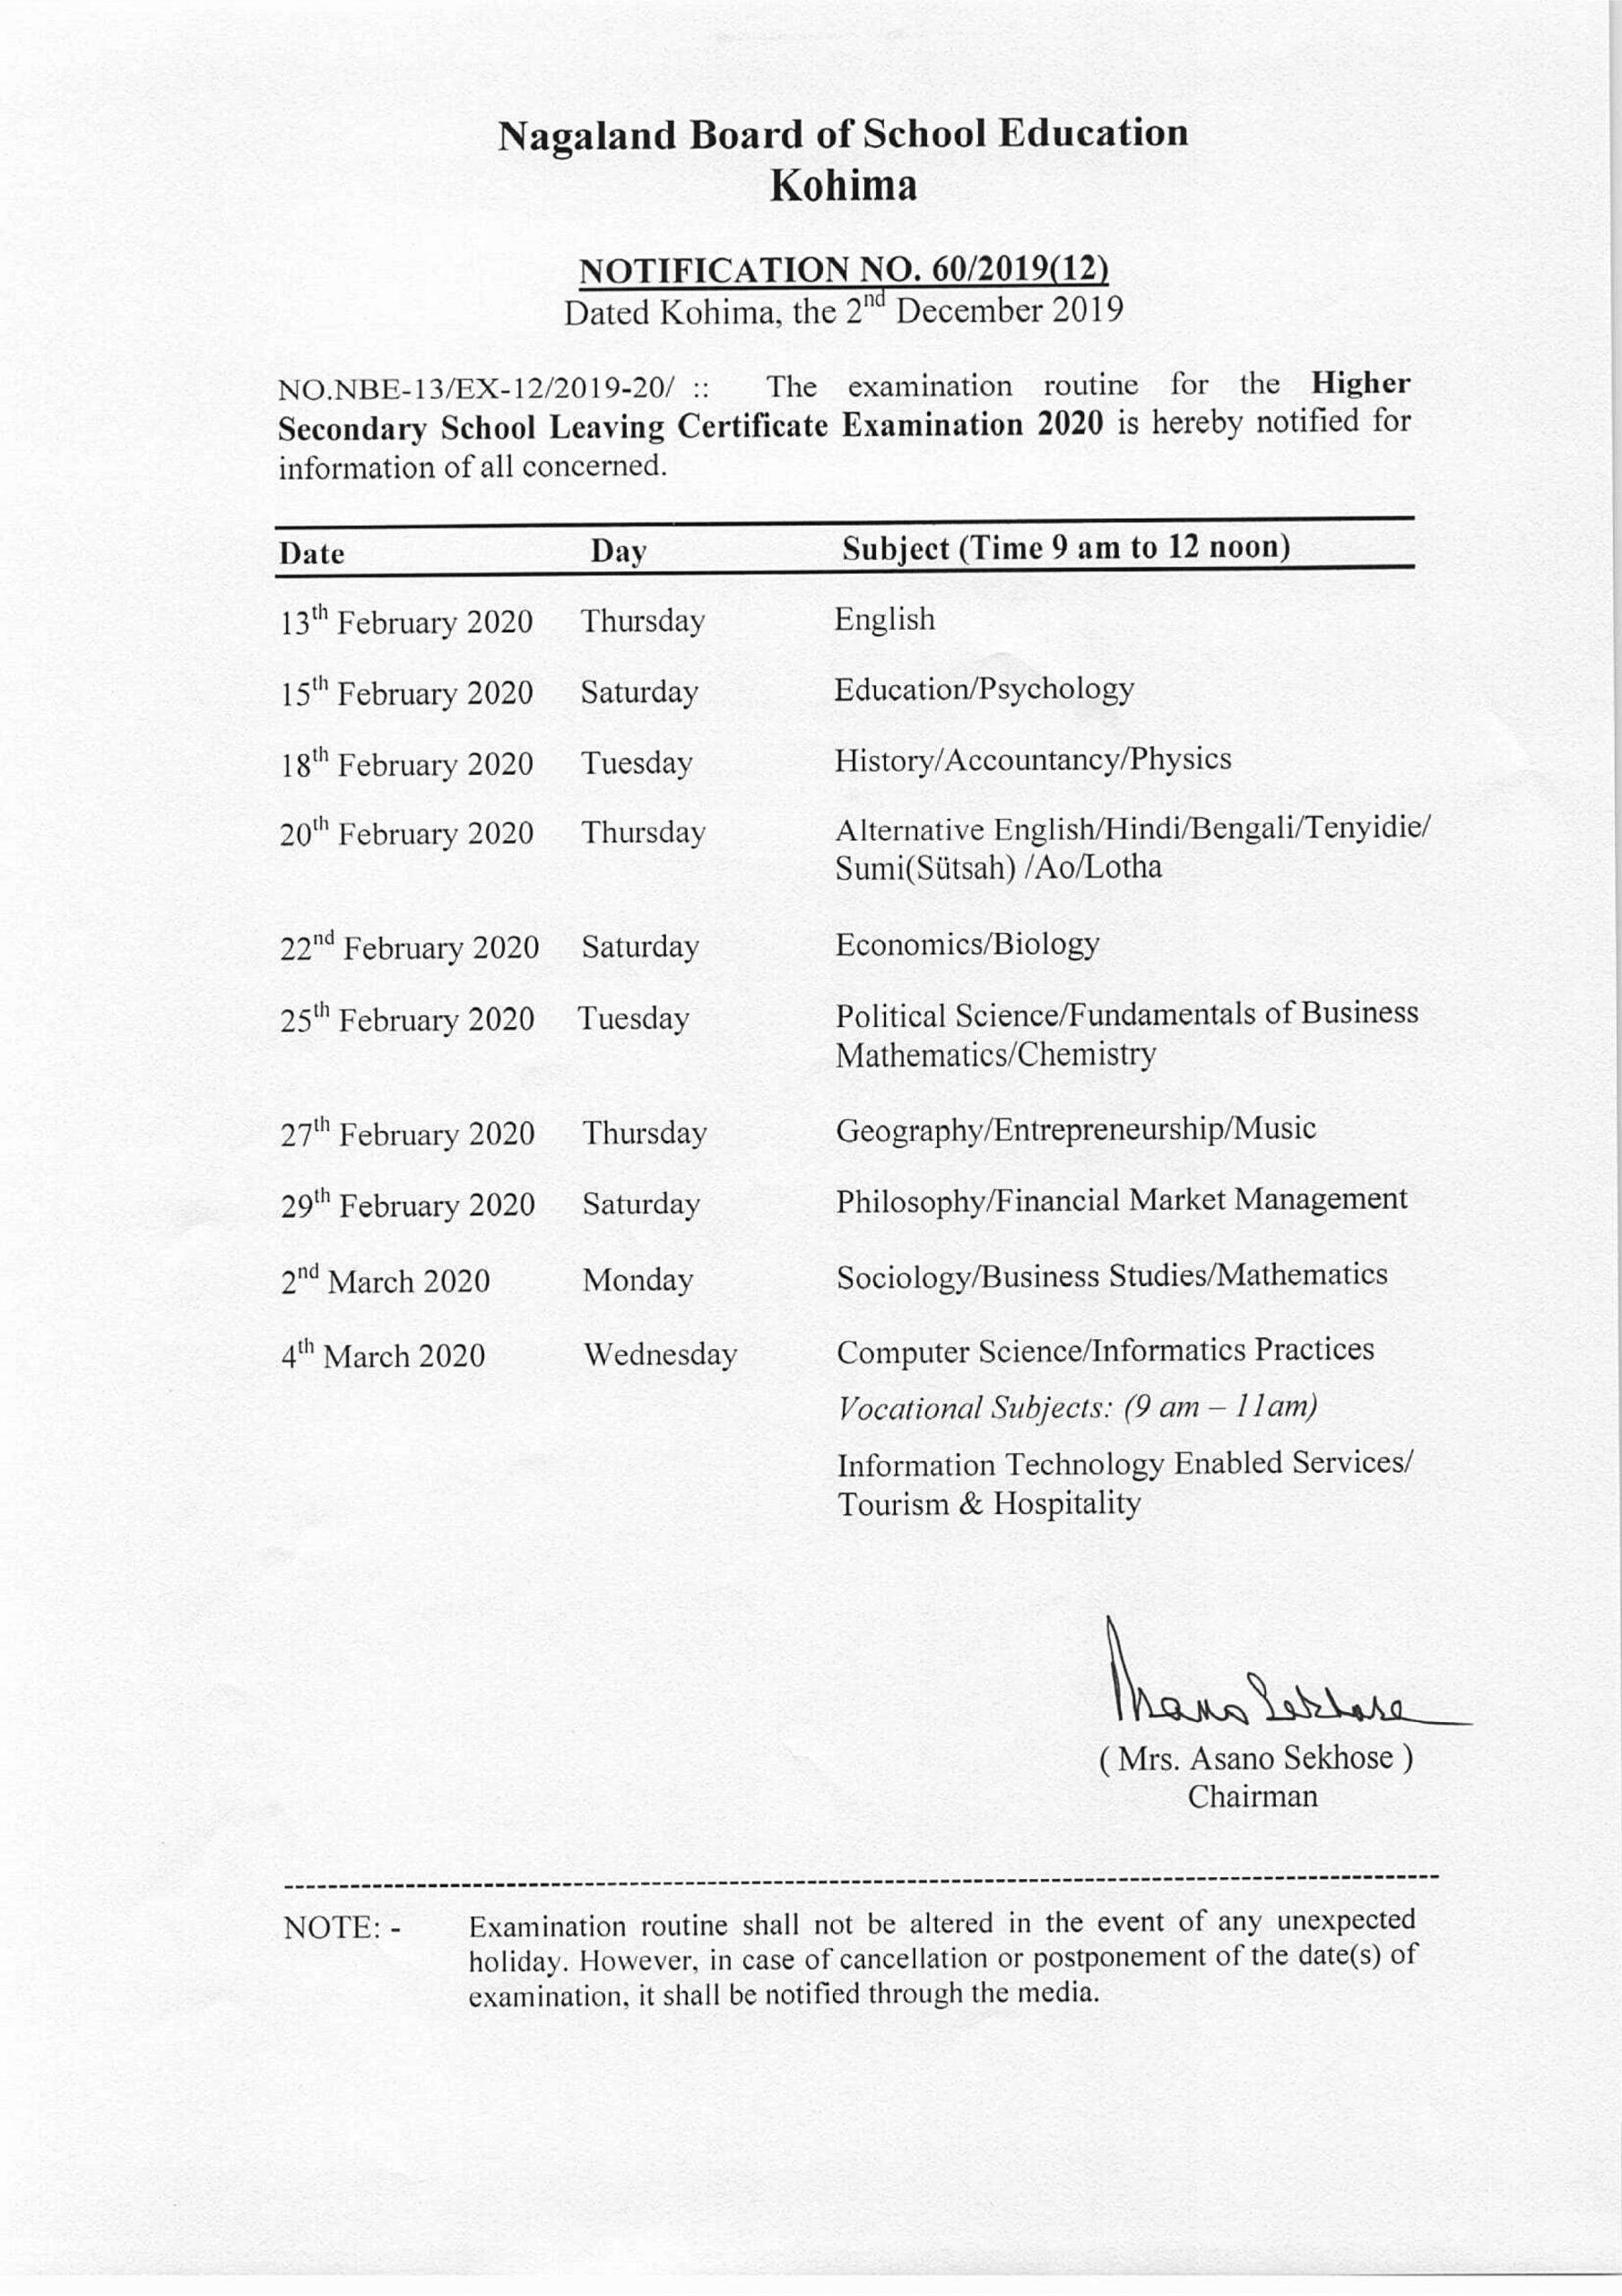 Nagaland HSSLC Routine 2020